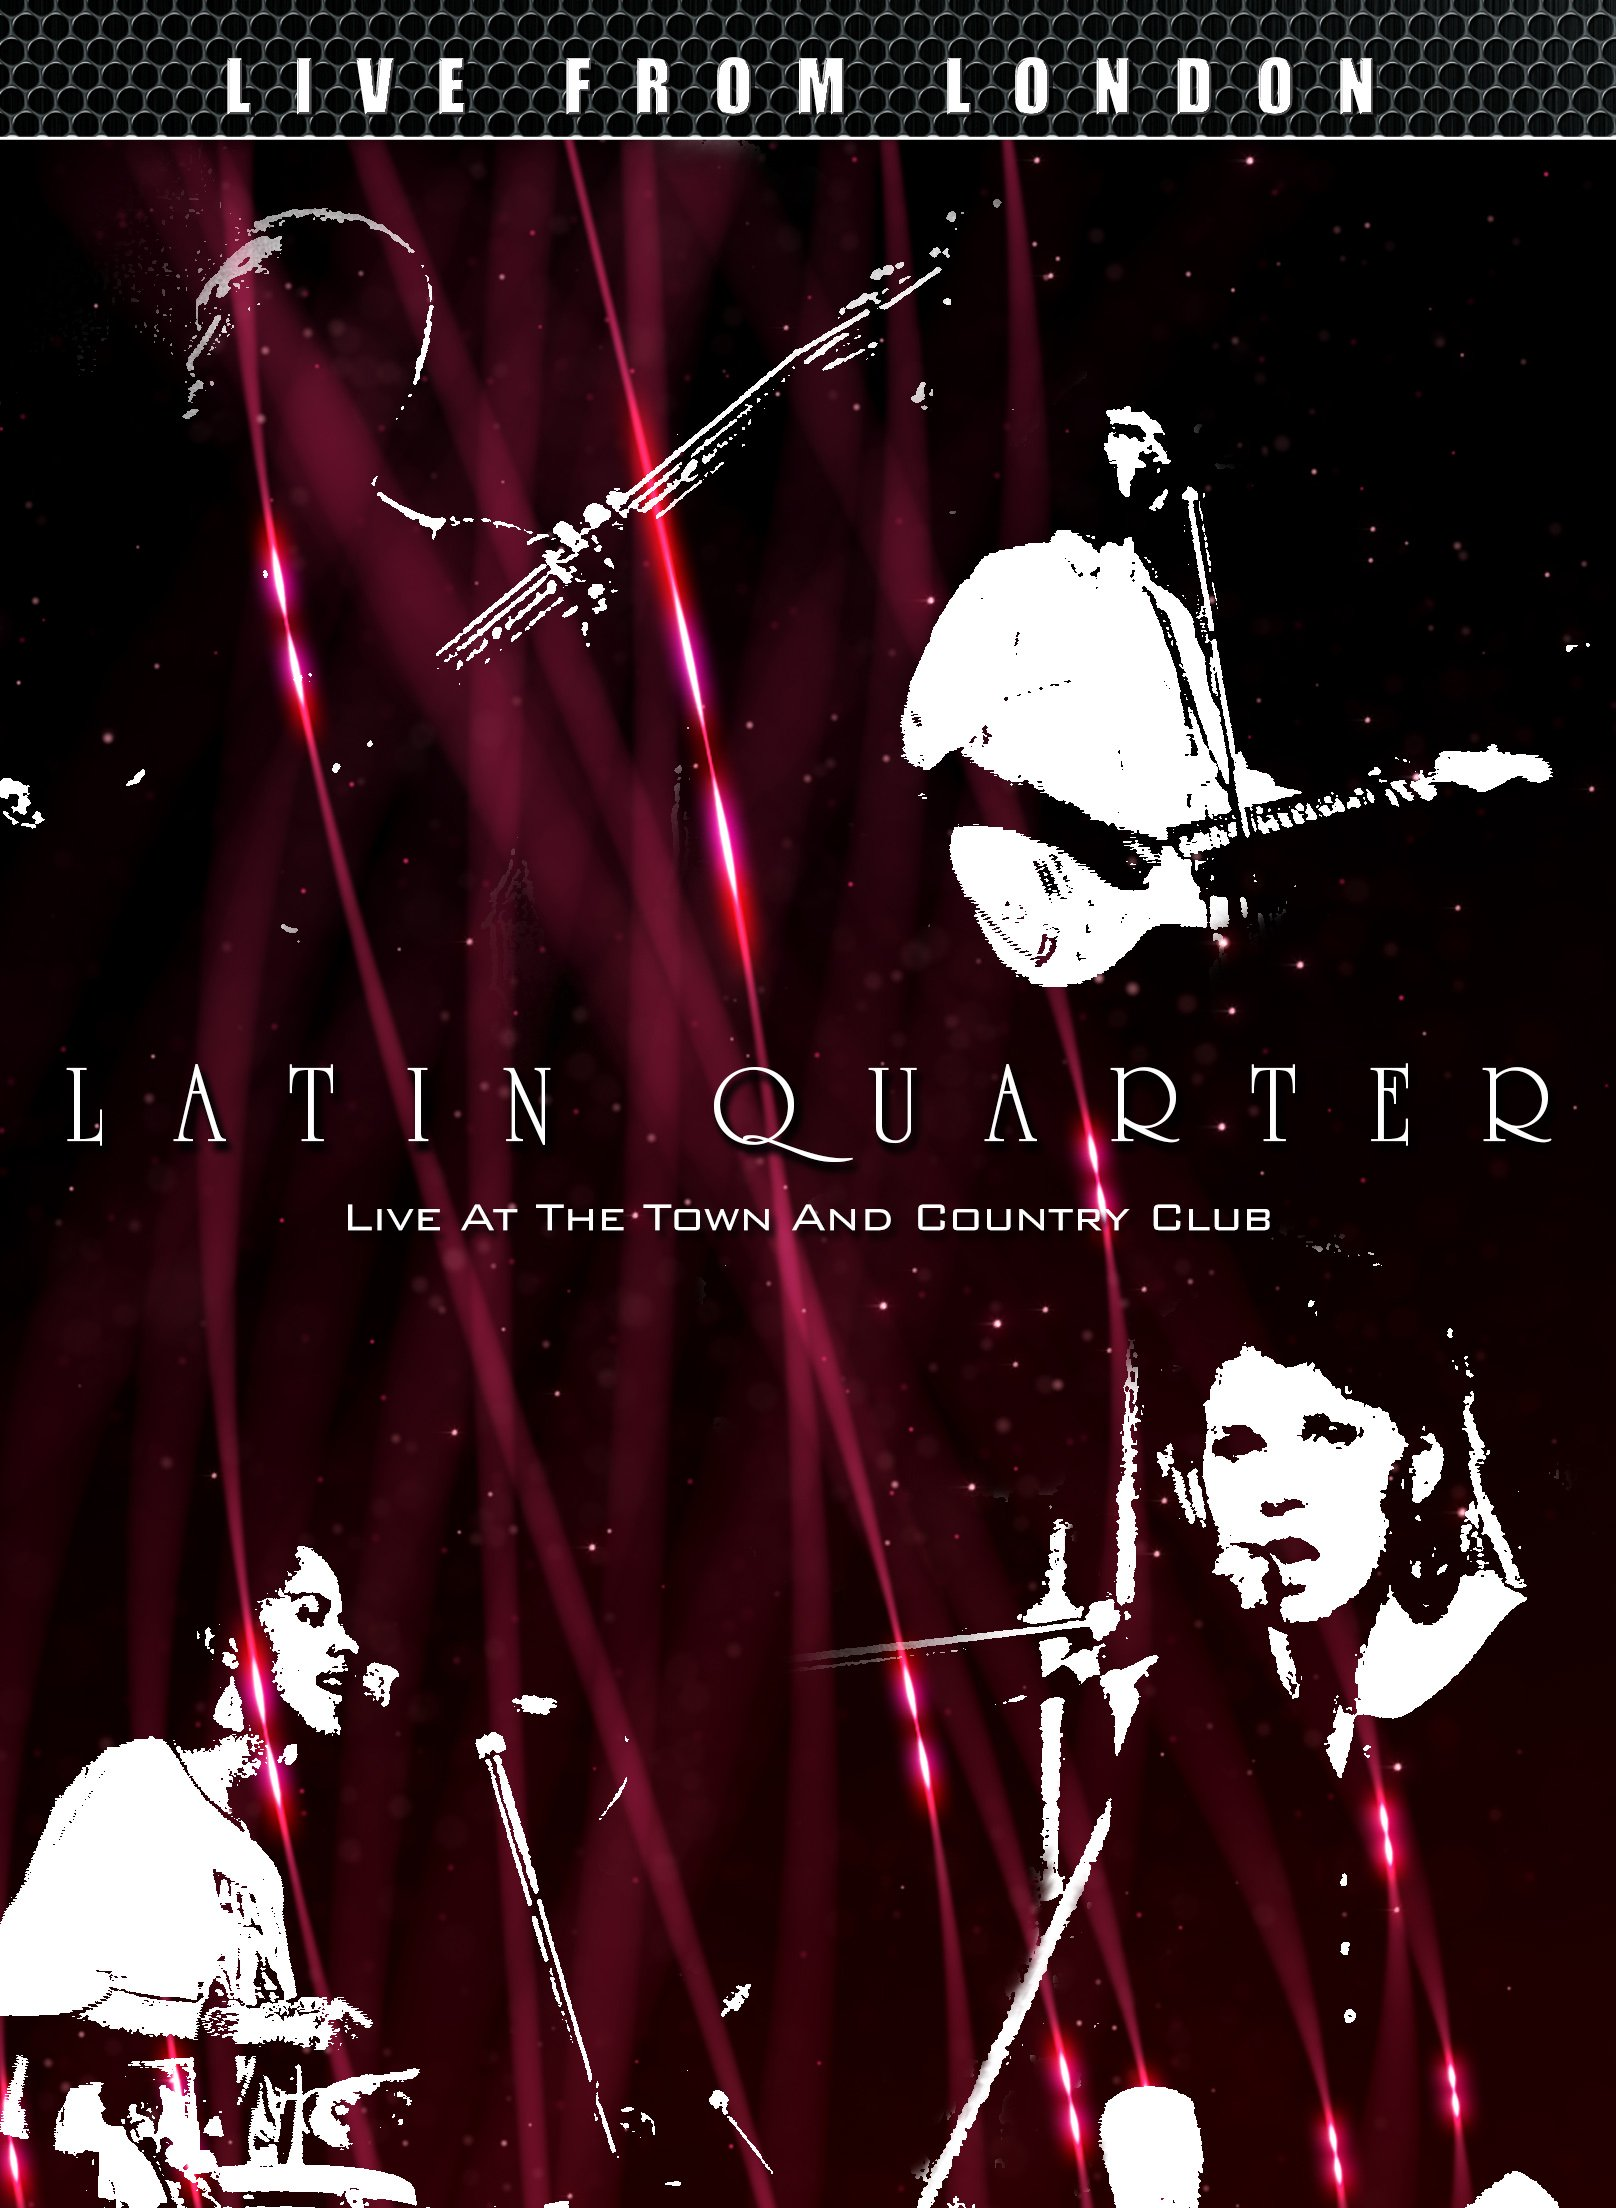 Latin Quarter - Live From London (DVD)